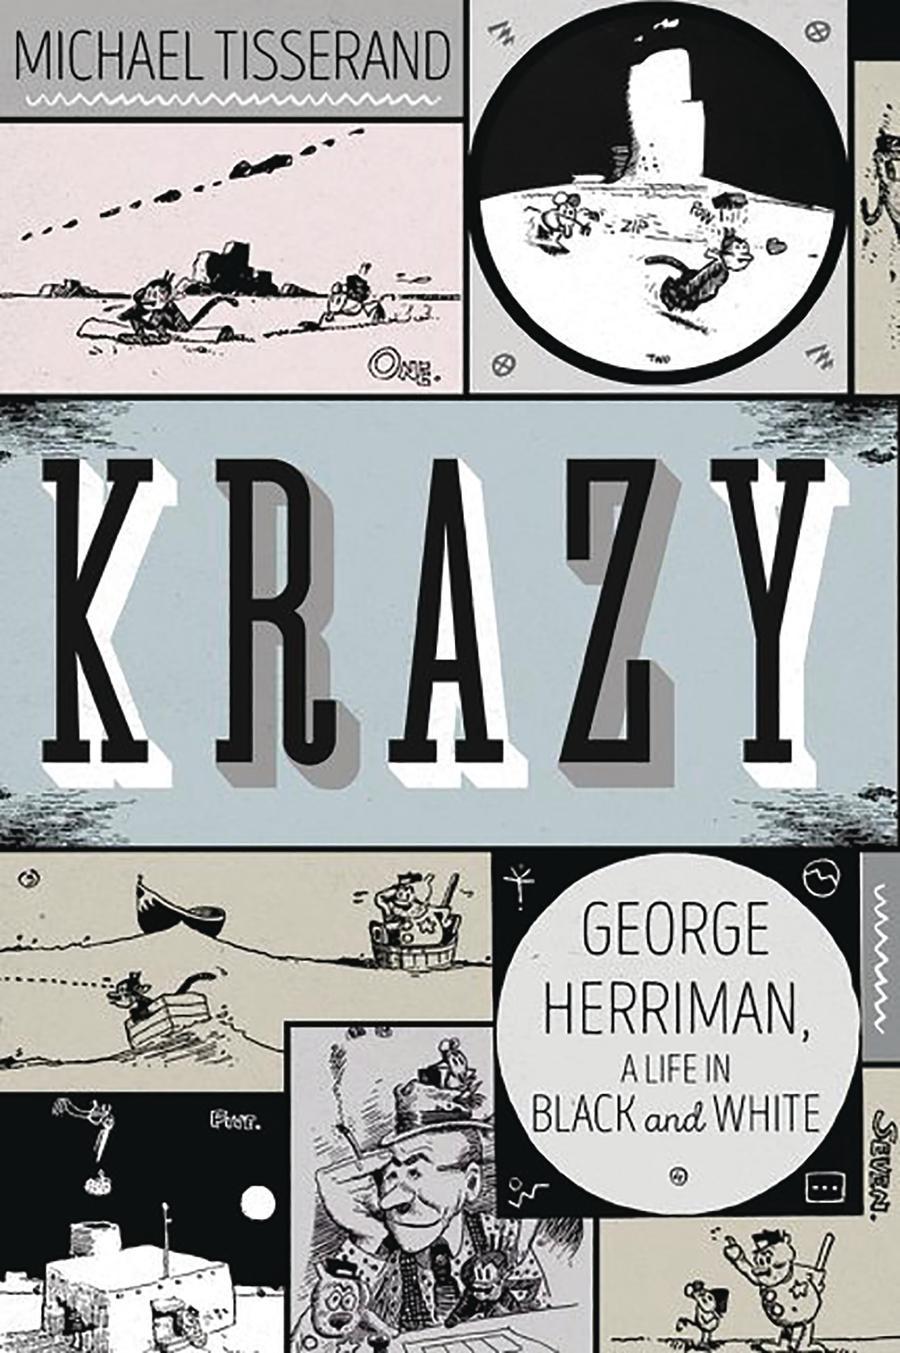 Krazy George Herriman A Life In Black & White SC